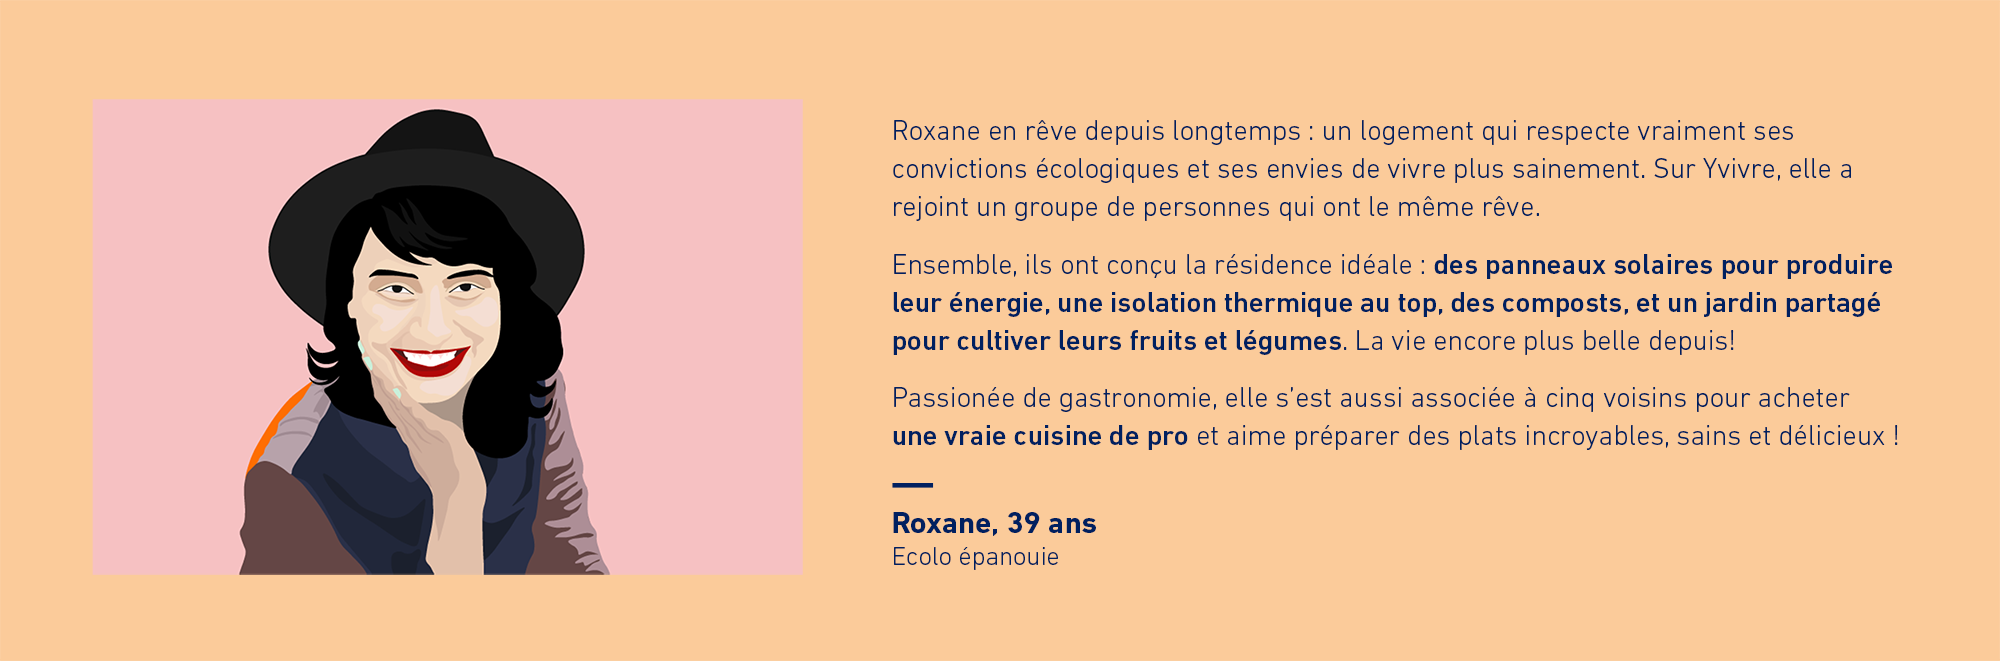 yvivre-sowood-roxane